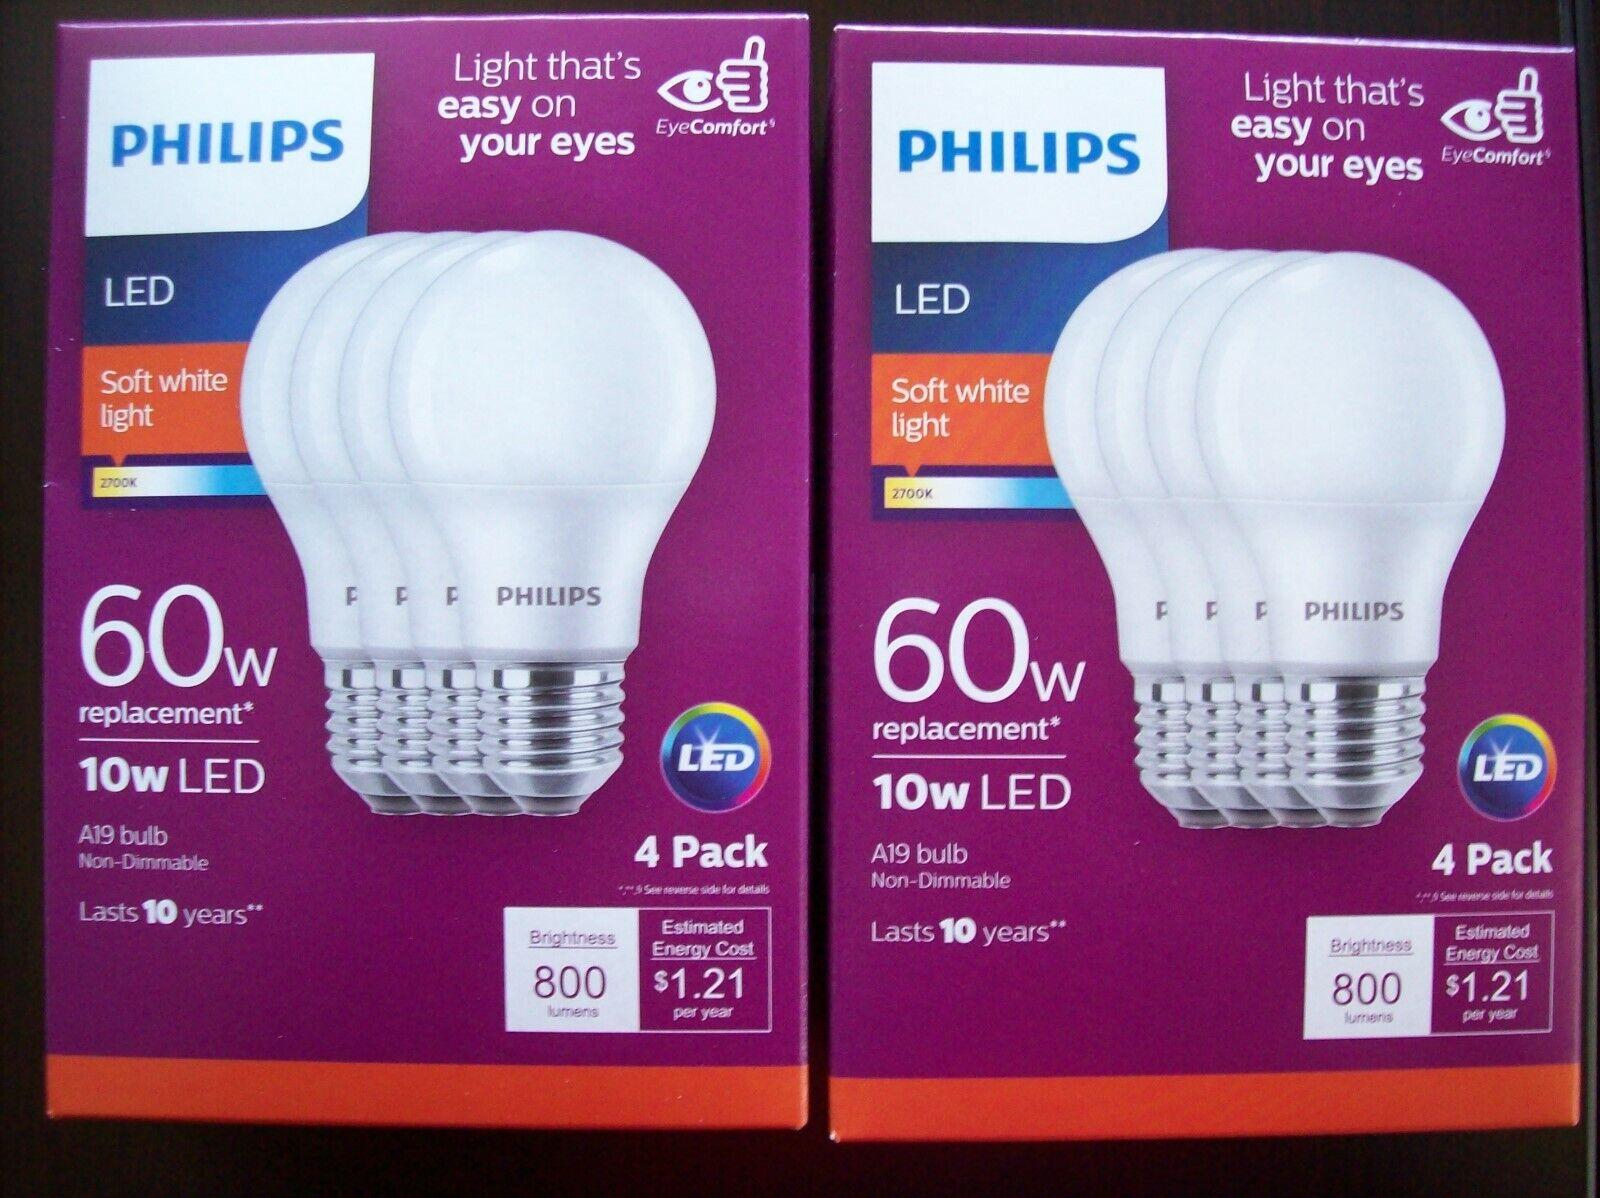 Philips - 800-lumen, 8.5w A19 Led Light Bulb, 60w Equivalent